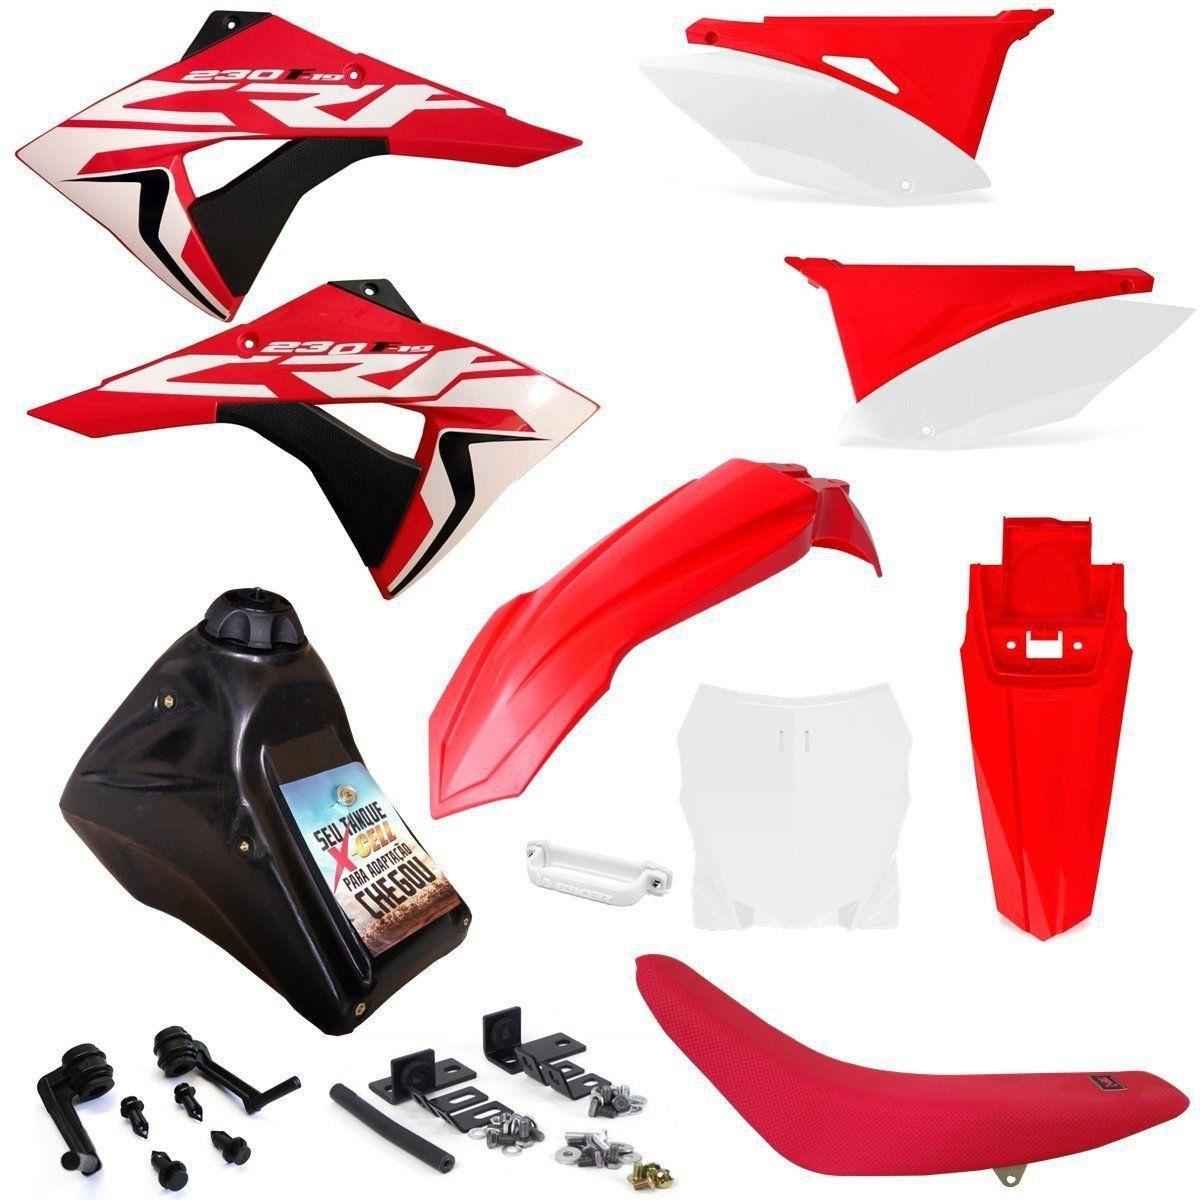 Kit Plástico Completo Crf 230 Adaptável Xr 250 Tornado Xr 200 Number